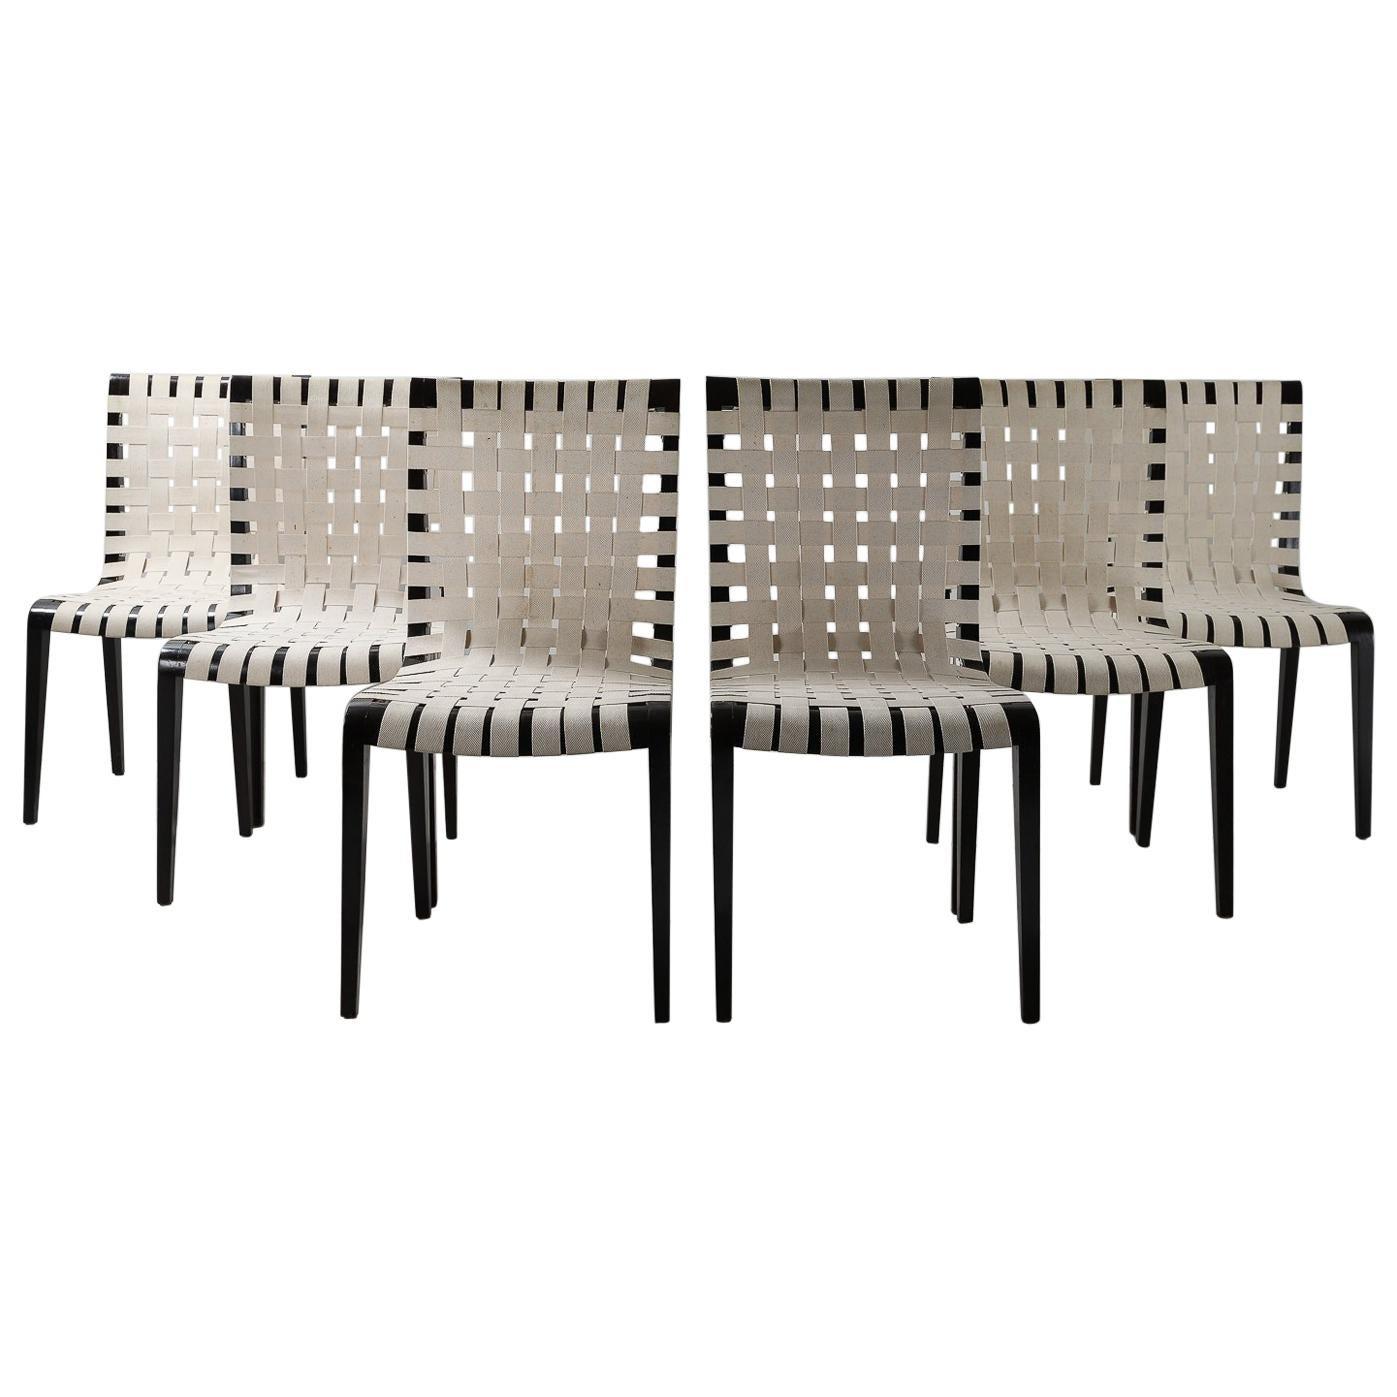 Set of 6 Augusto Romano Chairs, Italy 1950s